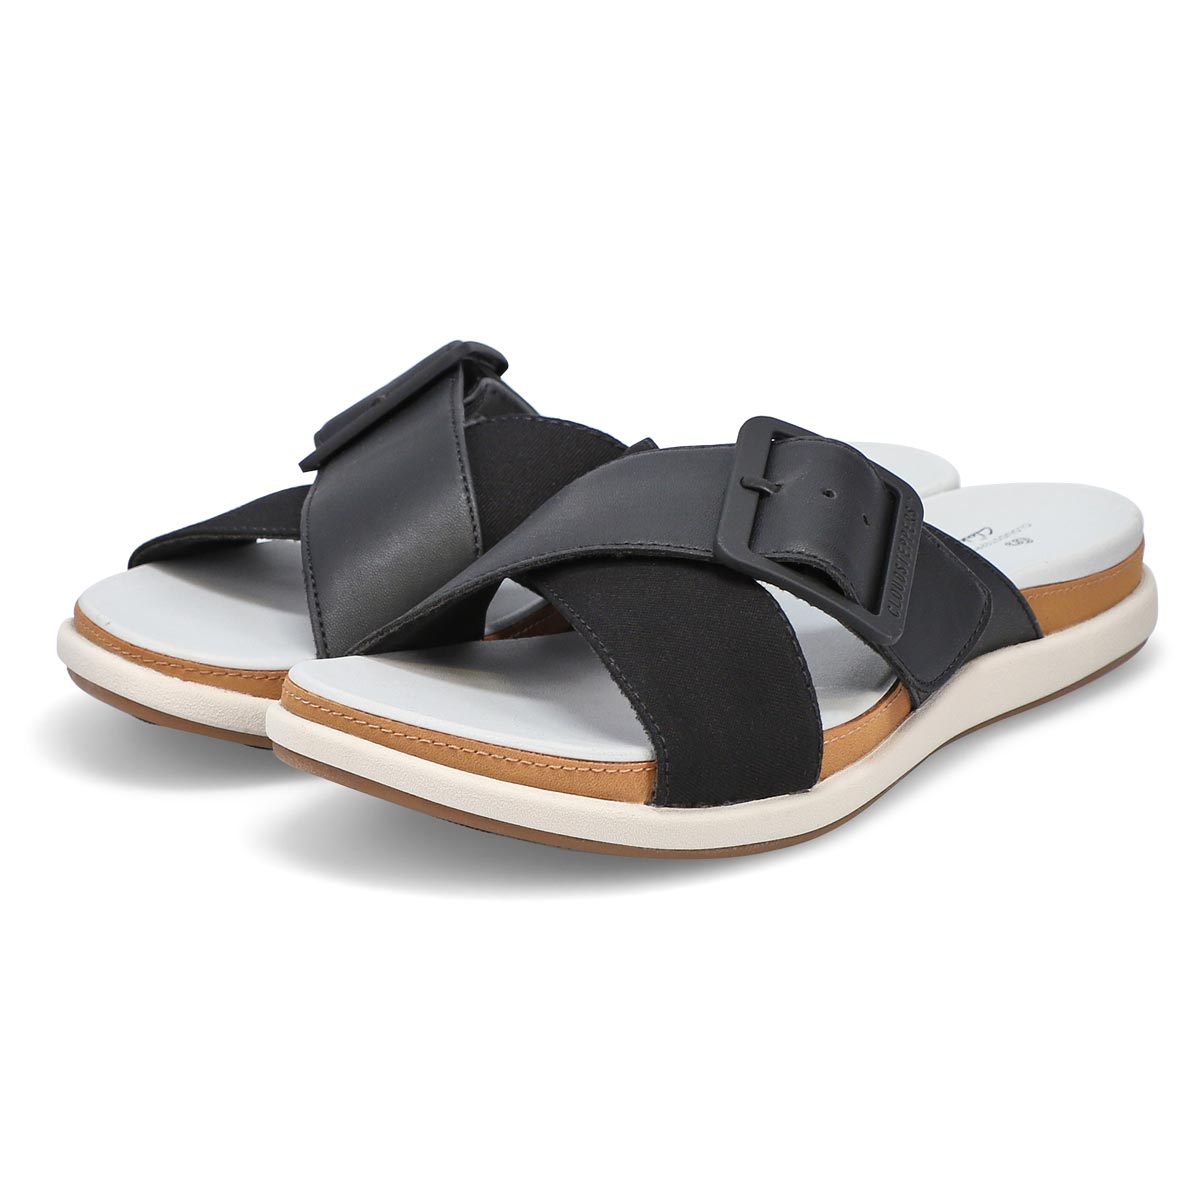 Women's Eliza April Casual Slide Sandal - Black